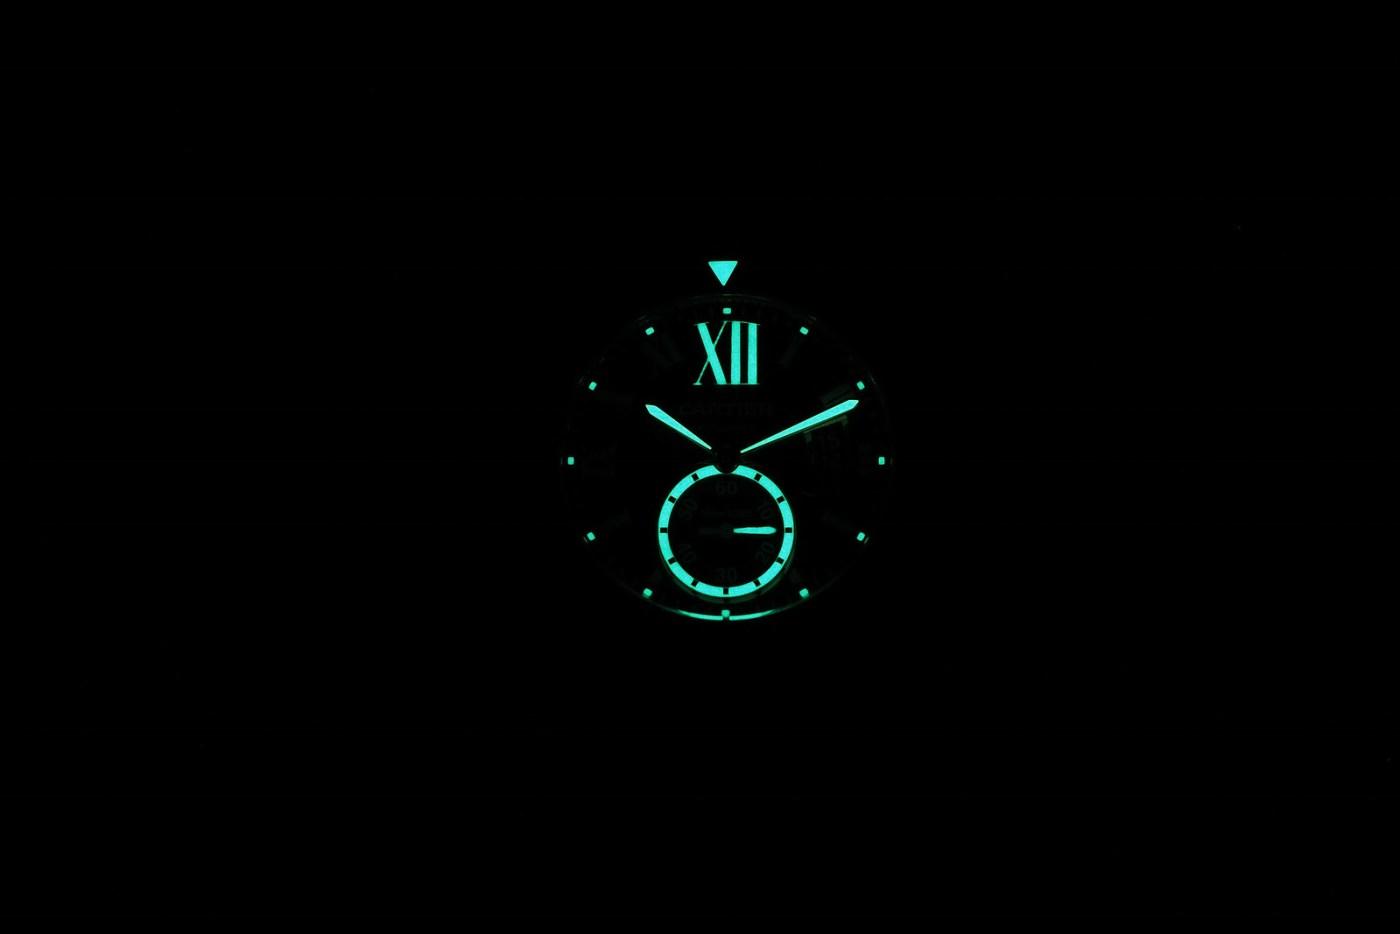 Cartier Two-Tone Diver's Watch lumeshot